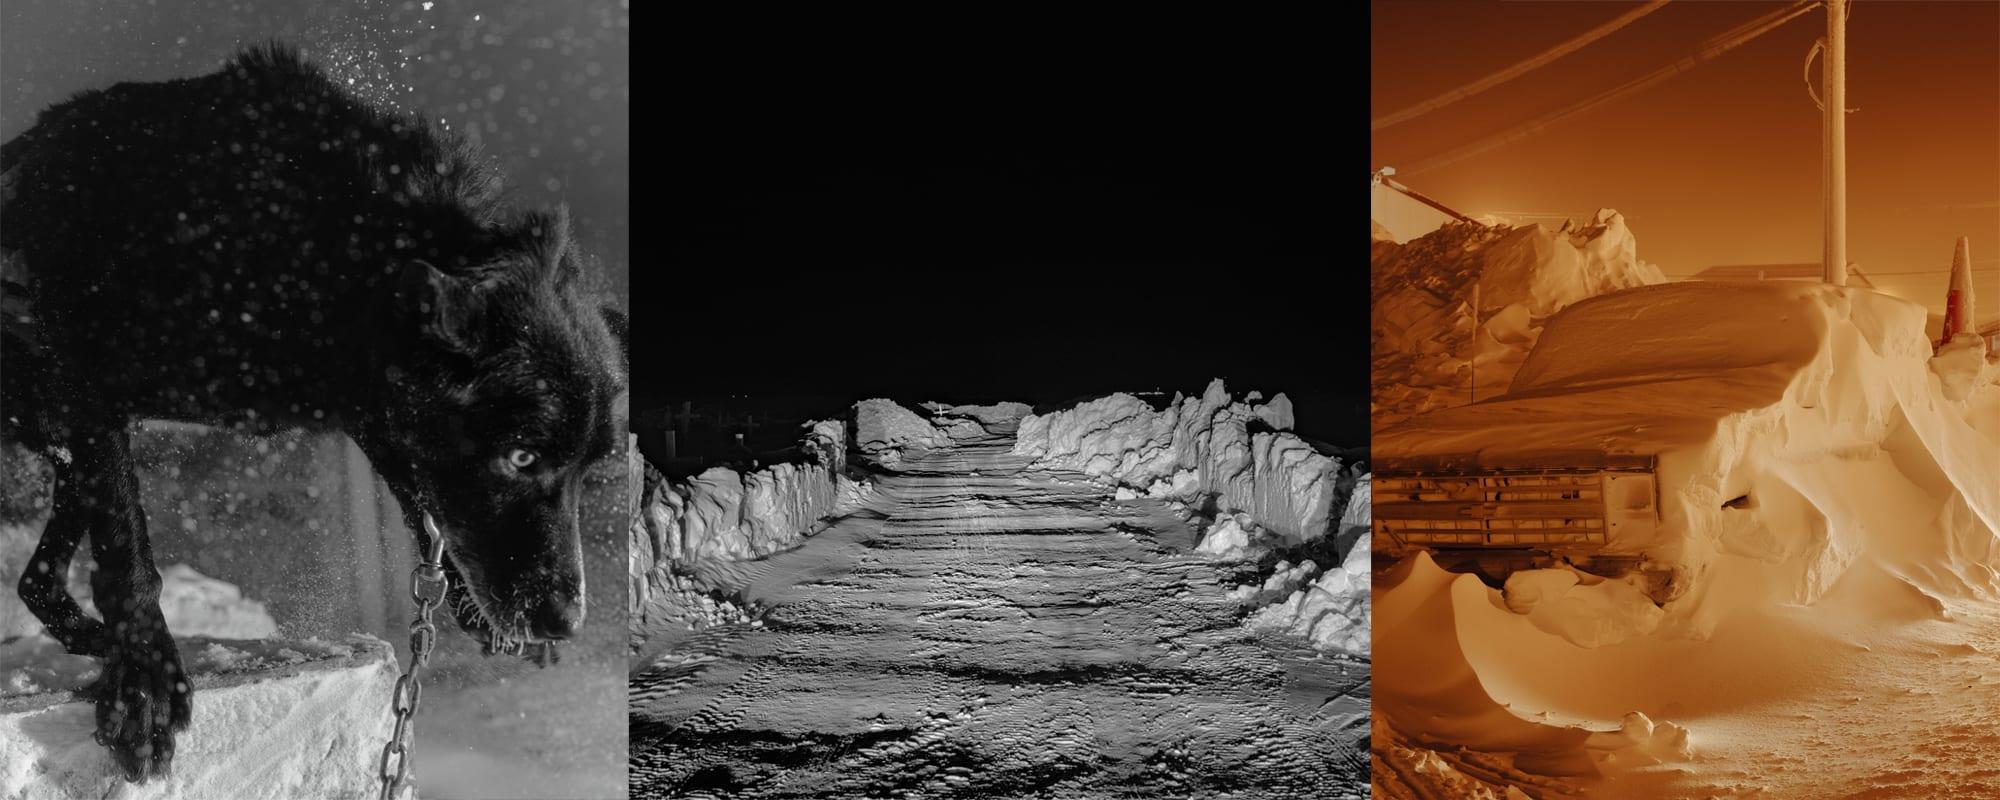 Mark Mahaney: Polar Night